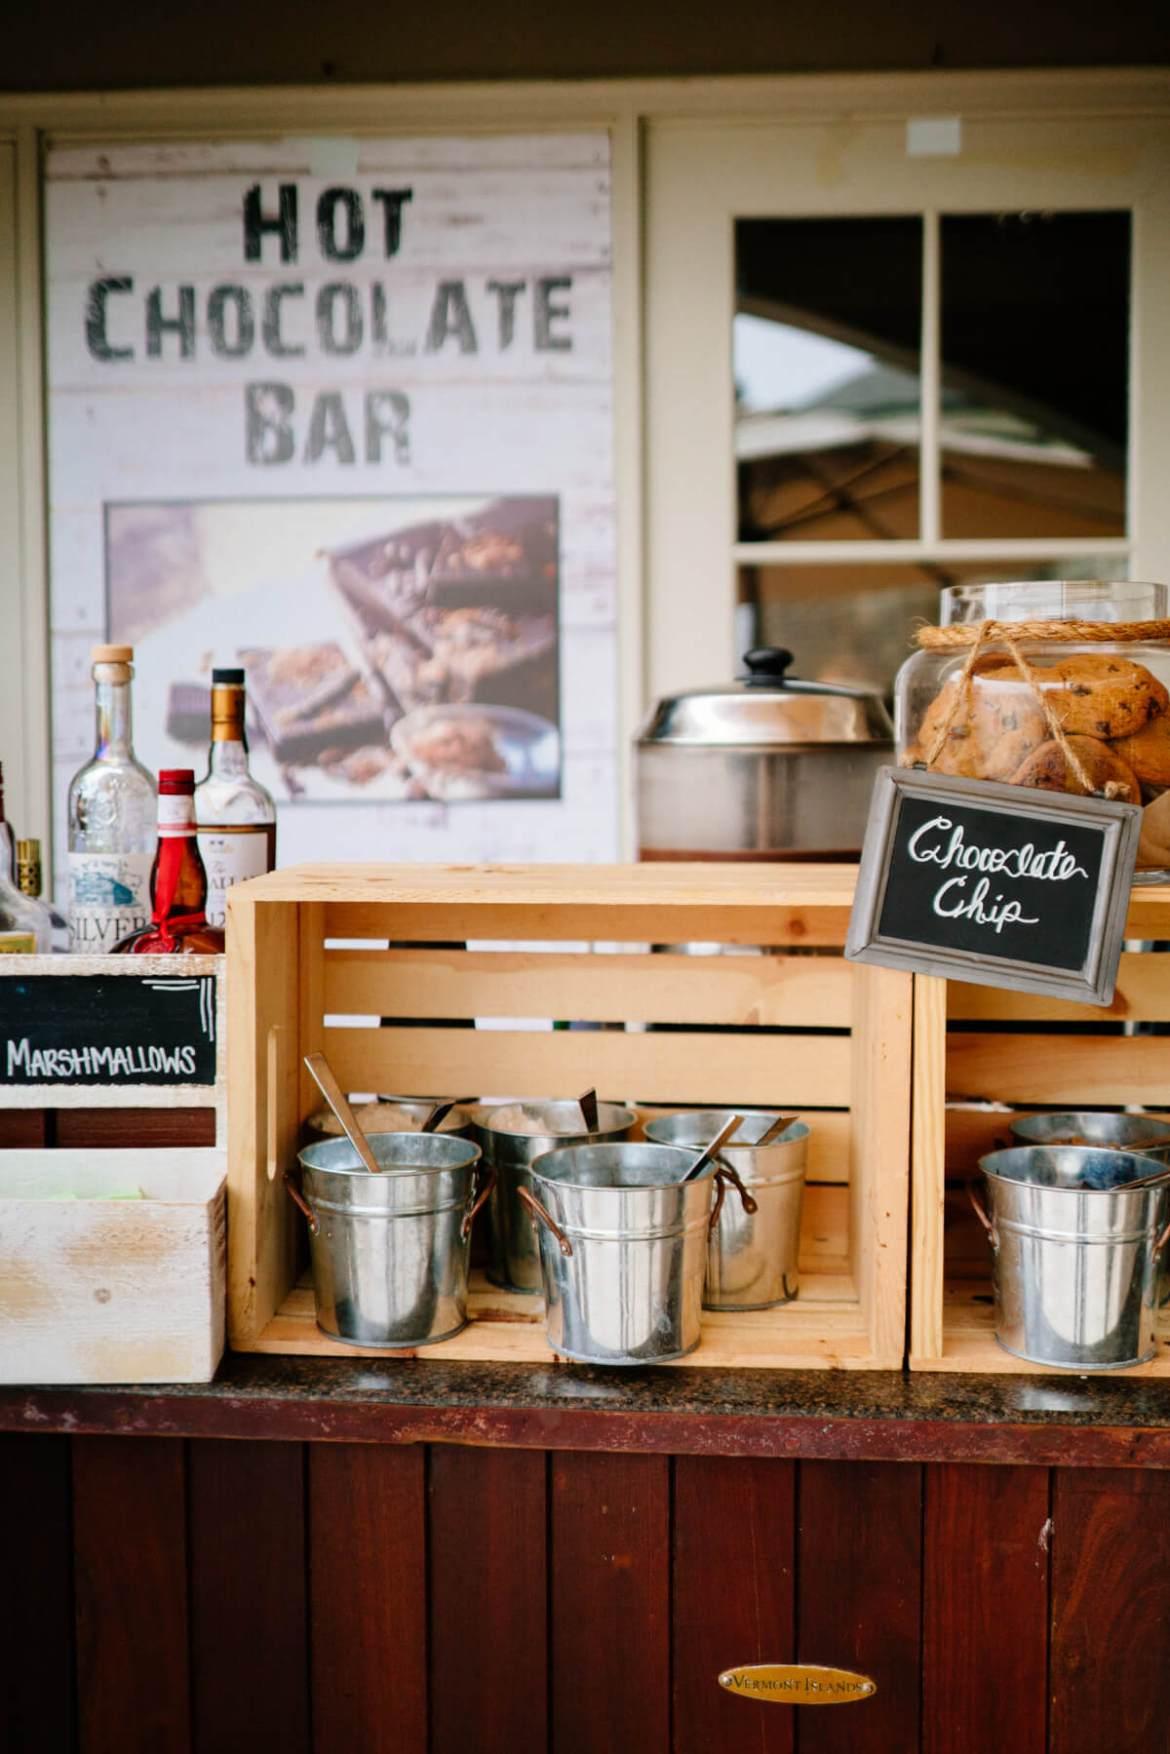 Hot chocolate bar at The Ritz-Carlton Half Moon Bay